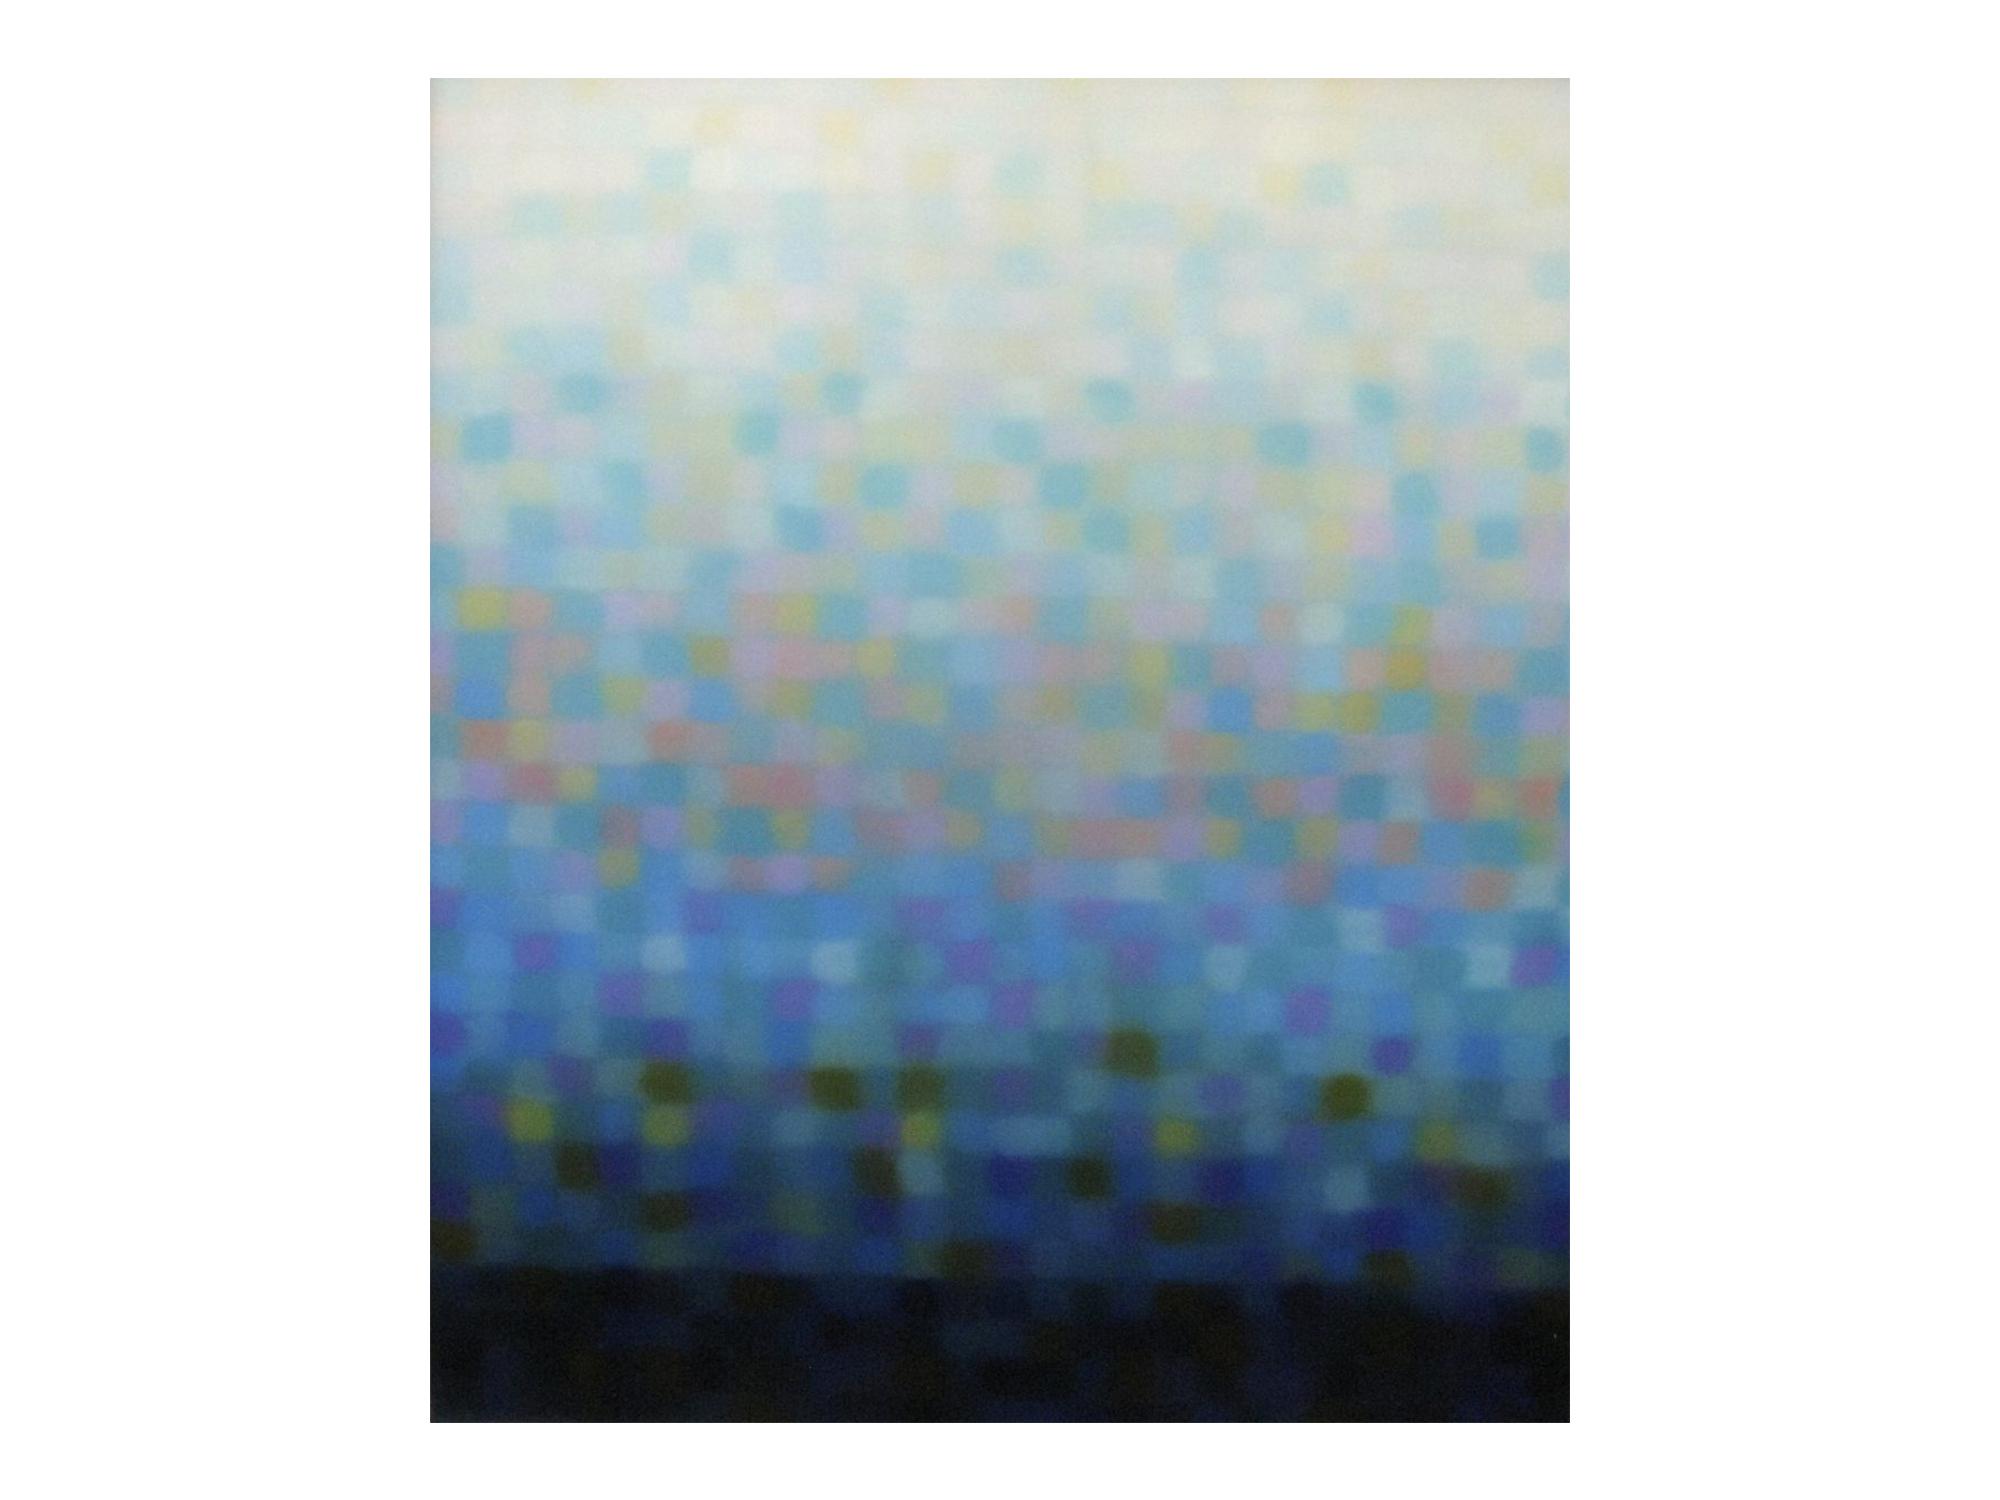 Matthew Johnson    Stratum Aqua II , 2014 oil on linen 13 x 11cm   ARTIST BIO